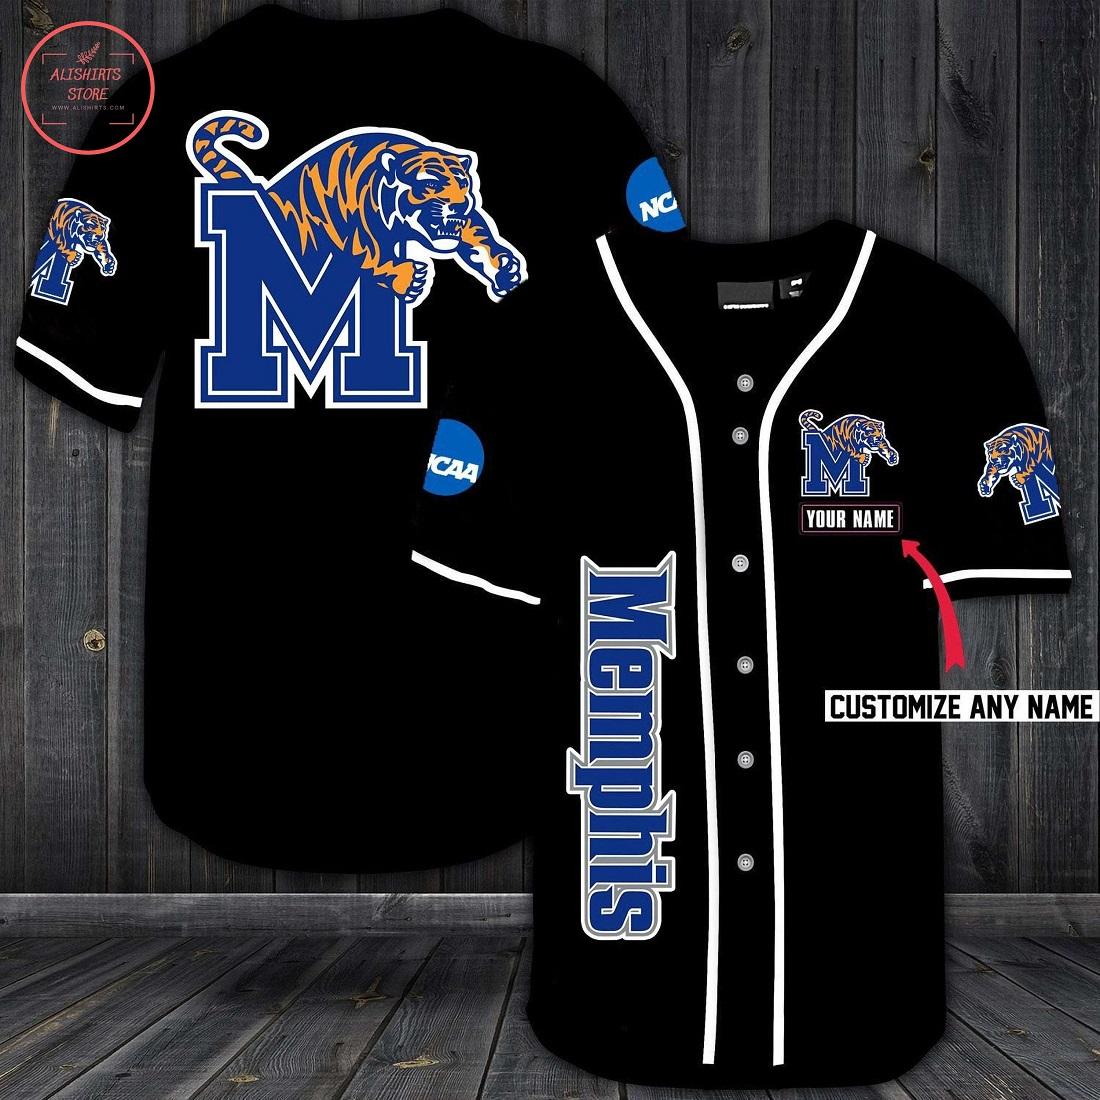 Memphis Tigers Personalized Baseball Jersey